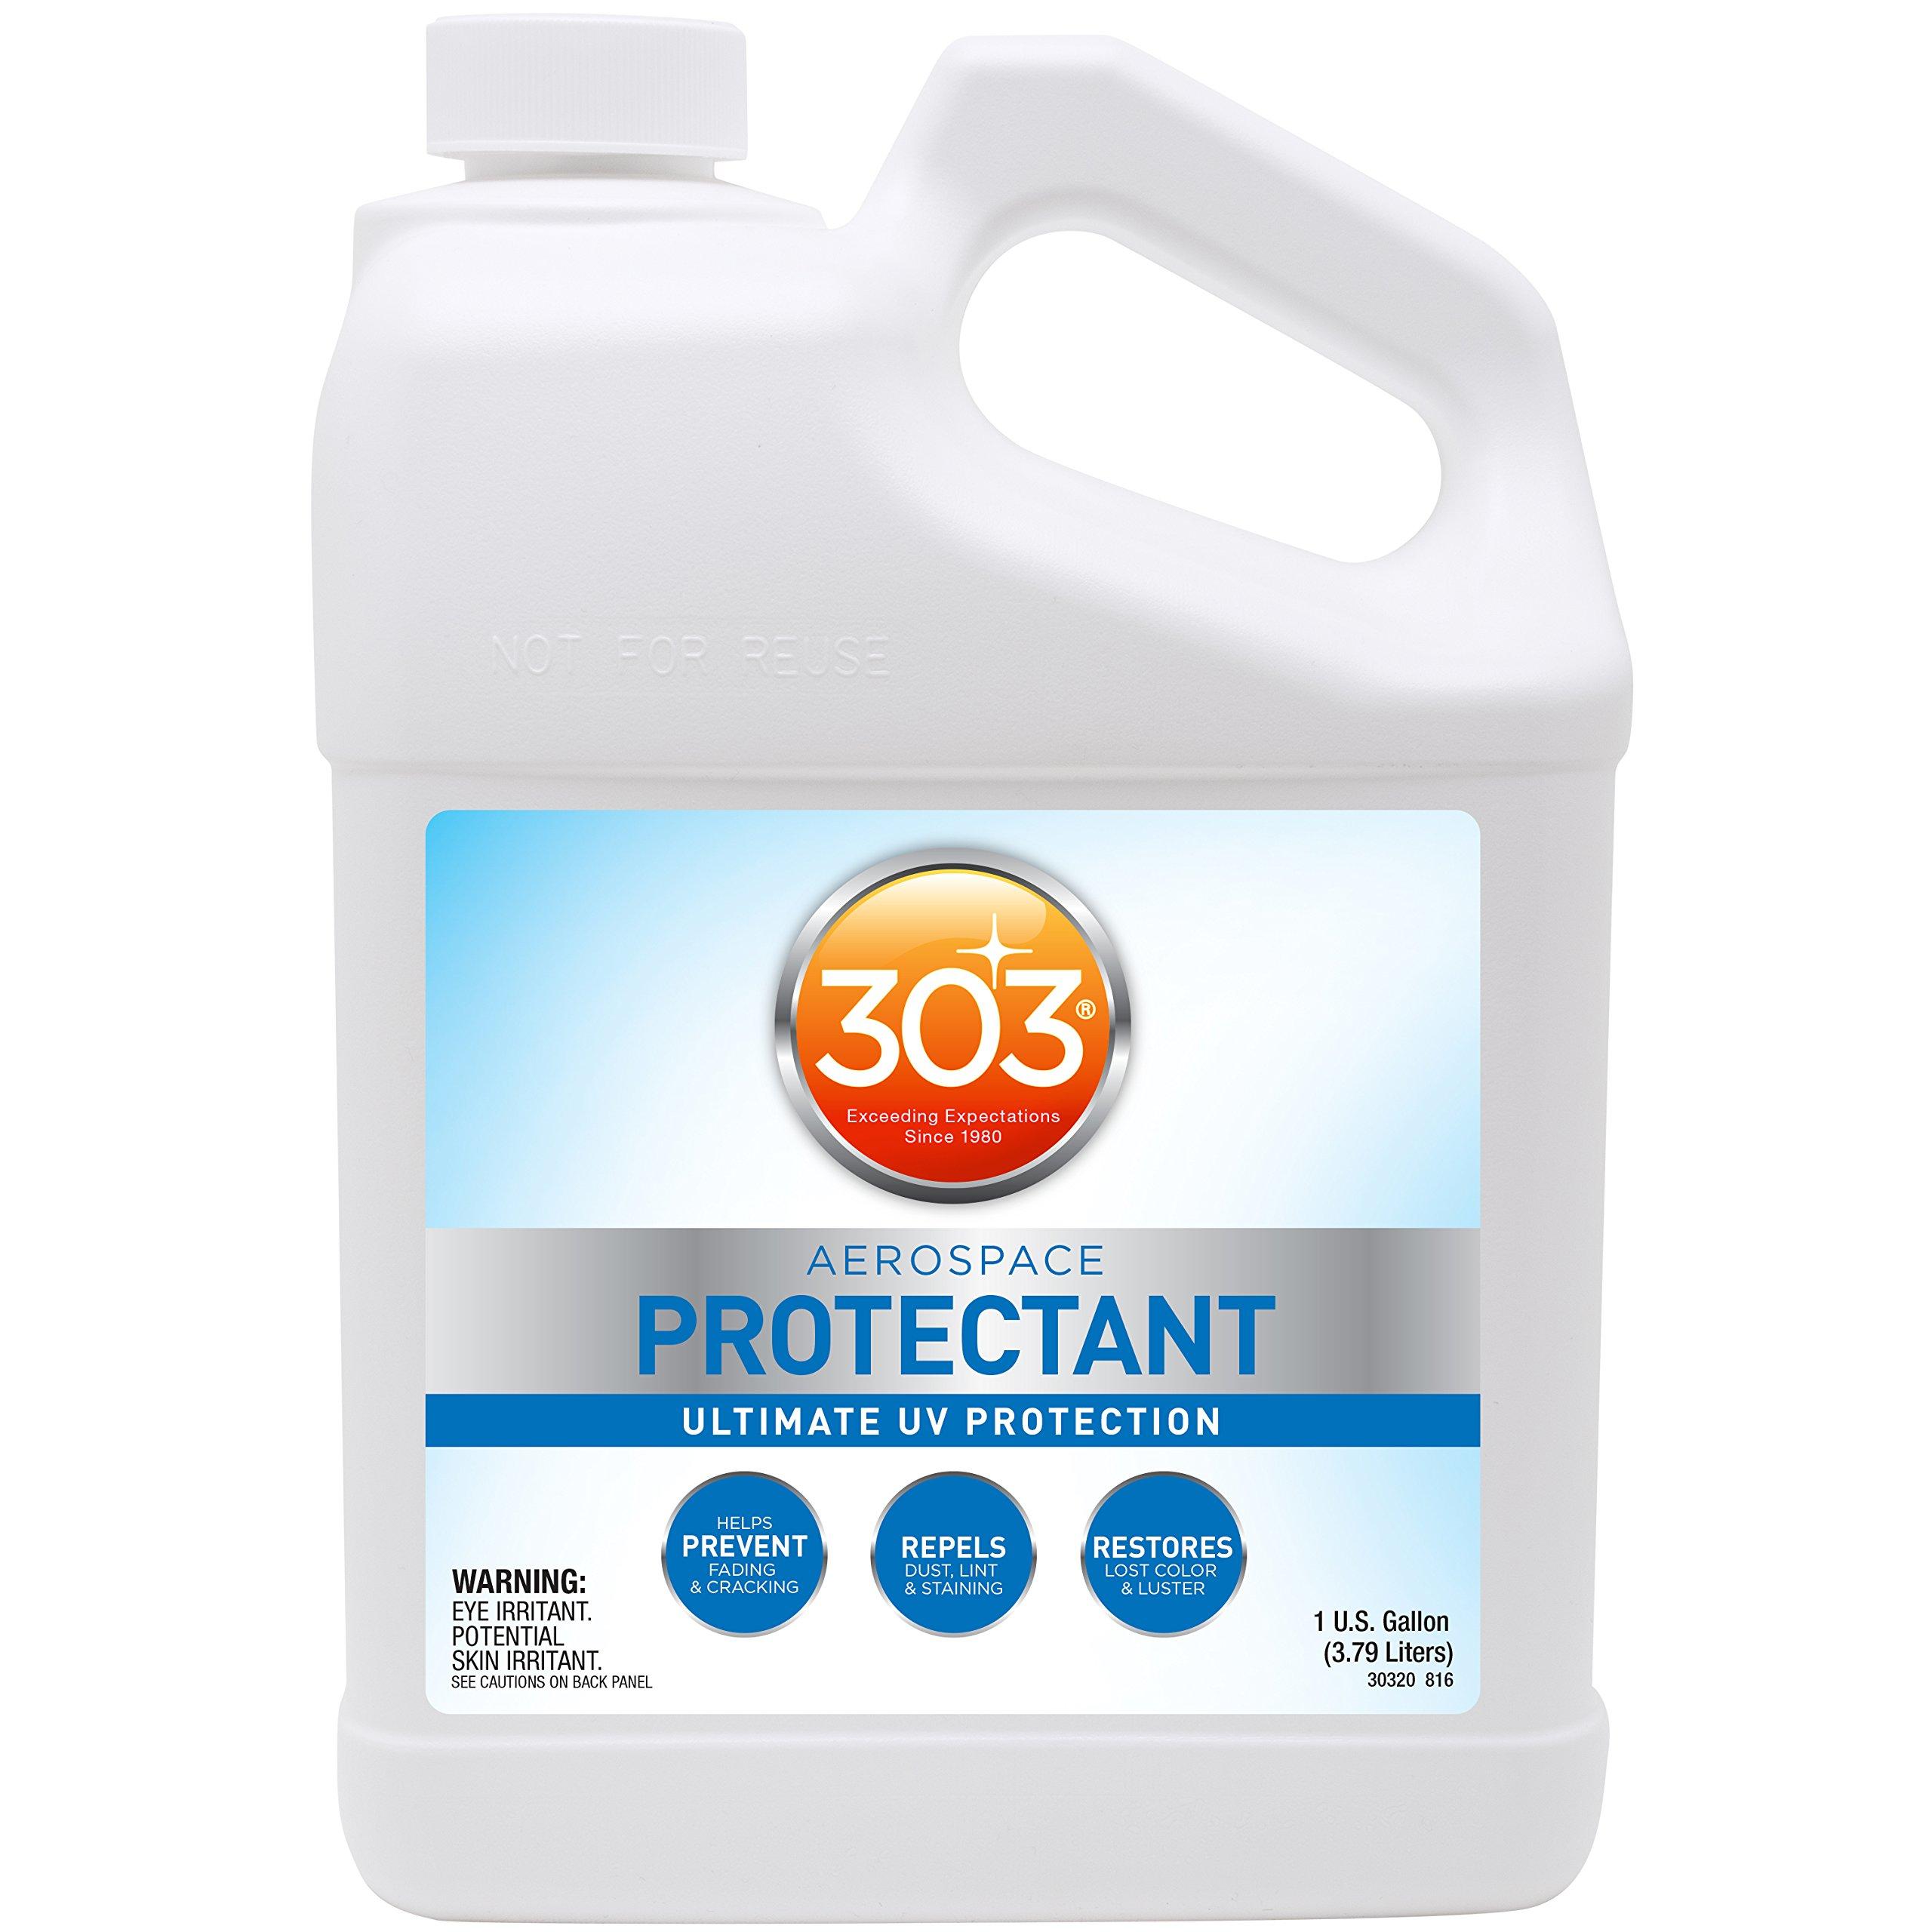 303 (30320-4PK) UV Protectant Gallon for Vinyl, Plastic, Rubber, Fiberglass, Leather & More - Dust and Dirt Repellant - Non-Toxic, Matte Finish, 128 Fl. oz., (Pack of 4)